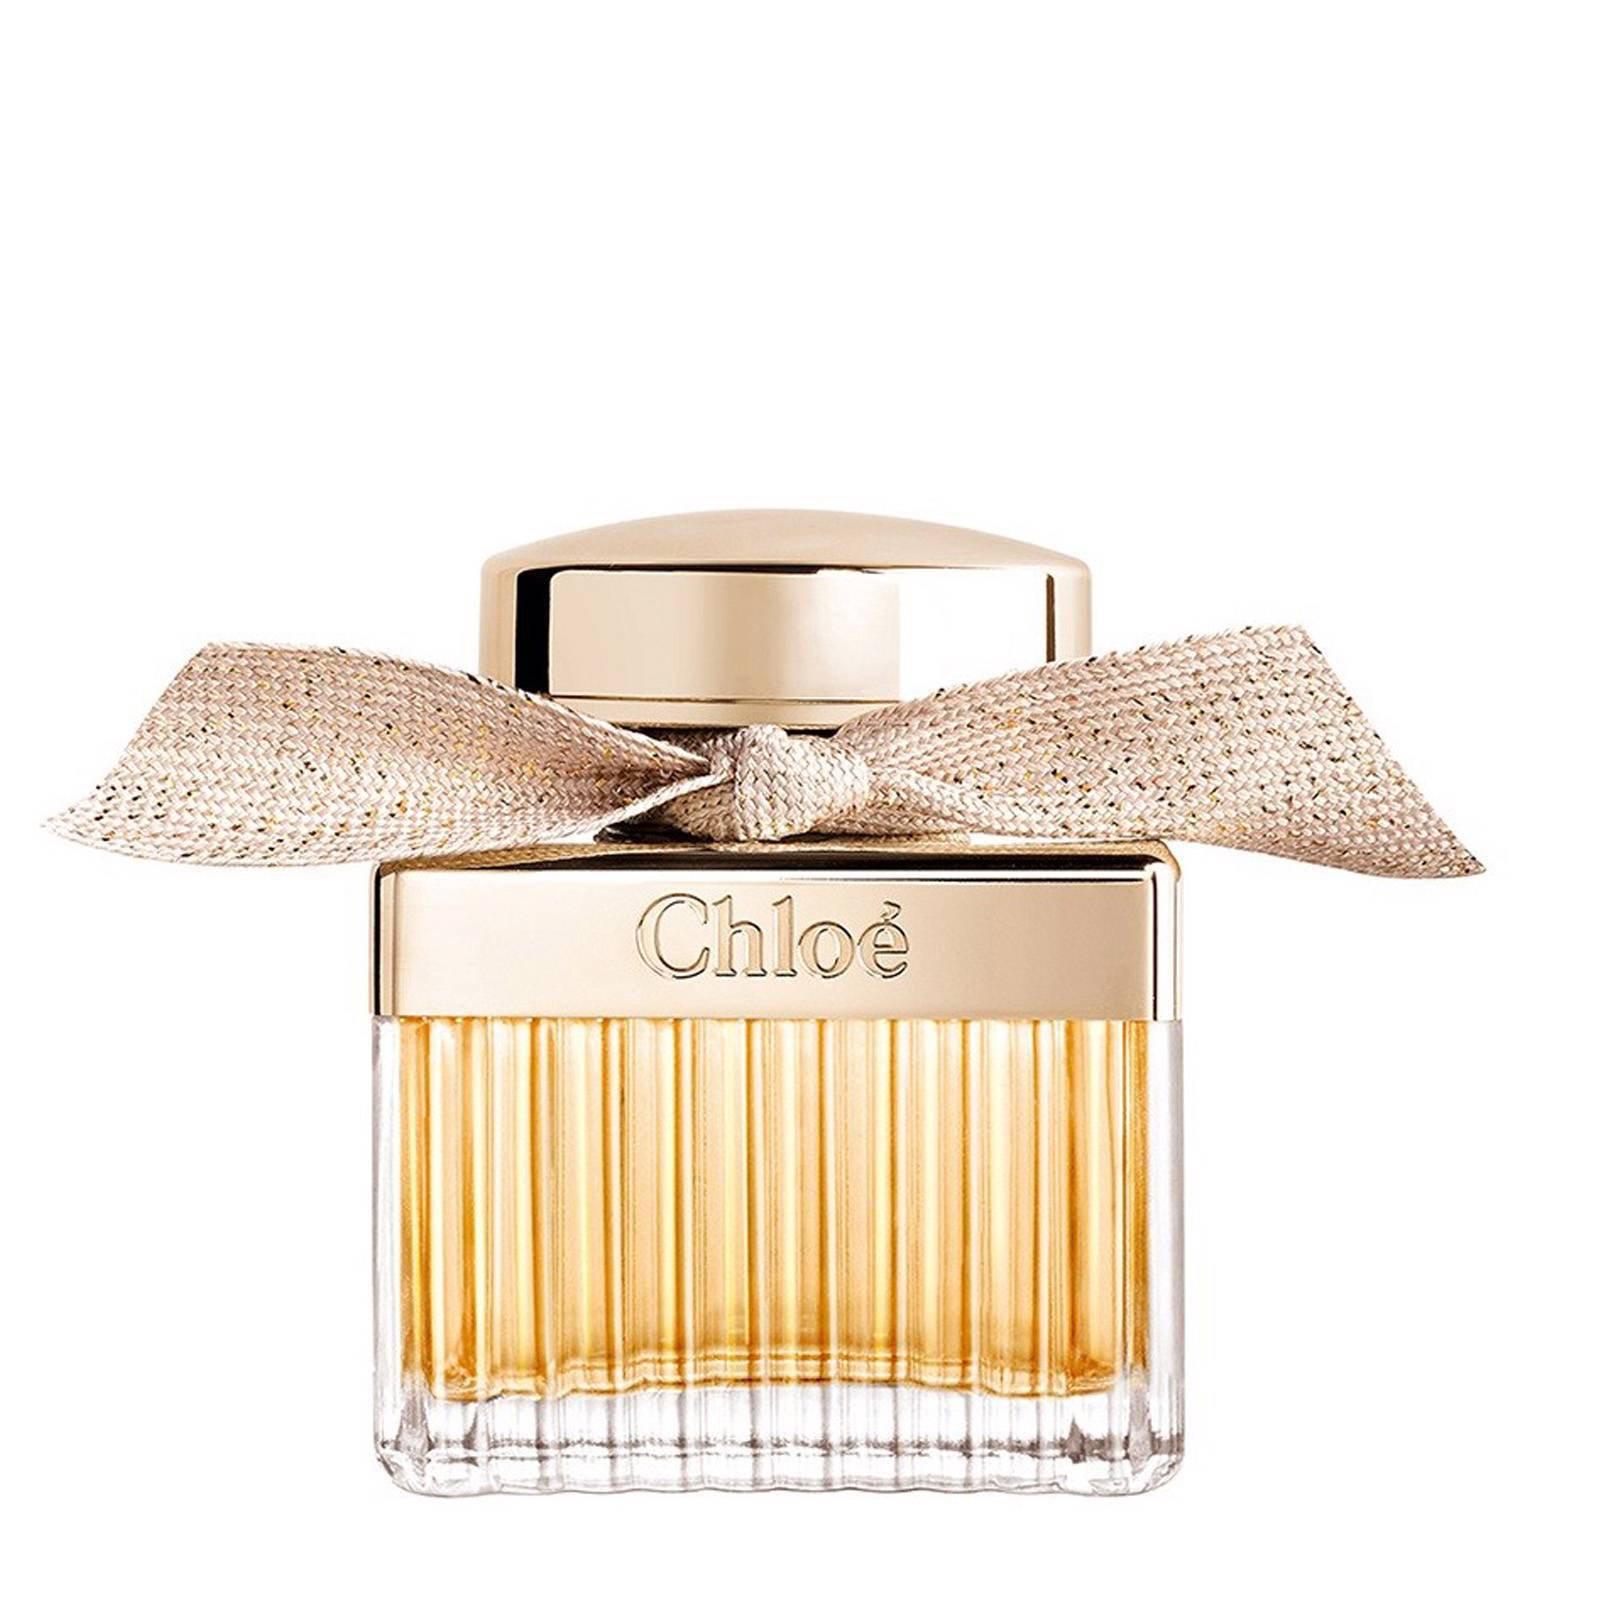 Chloe By Chloe eau de parfum 50 ml   wehkamp